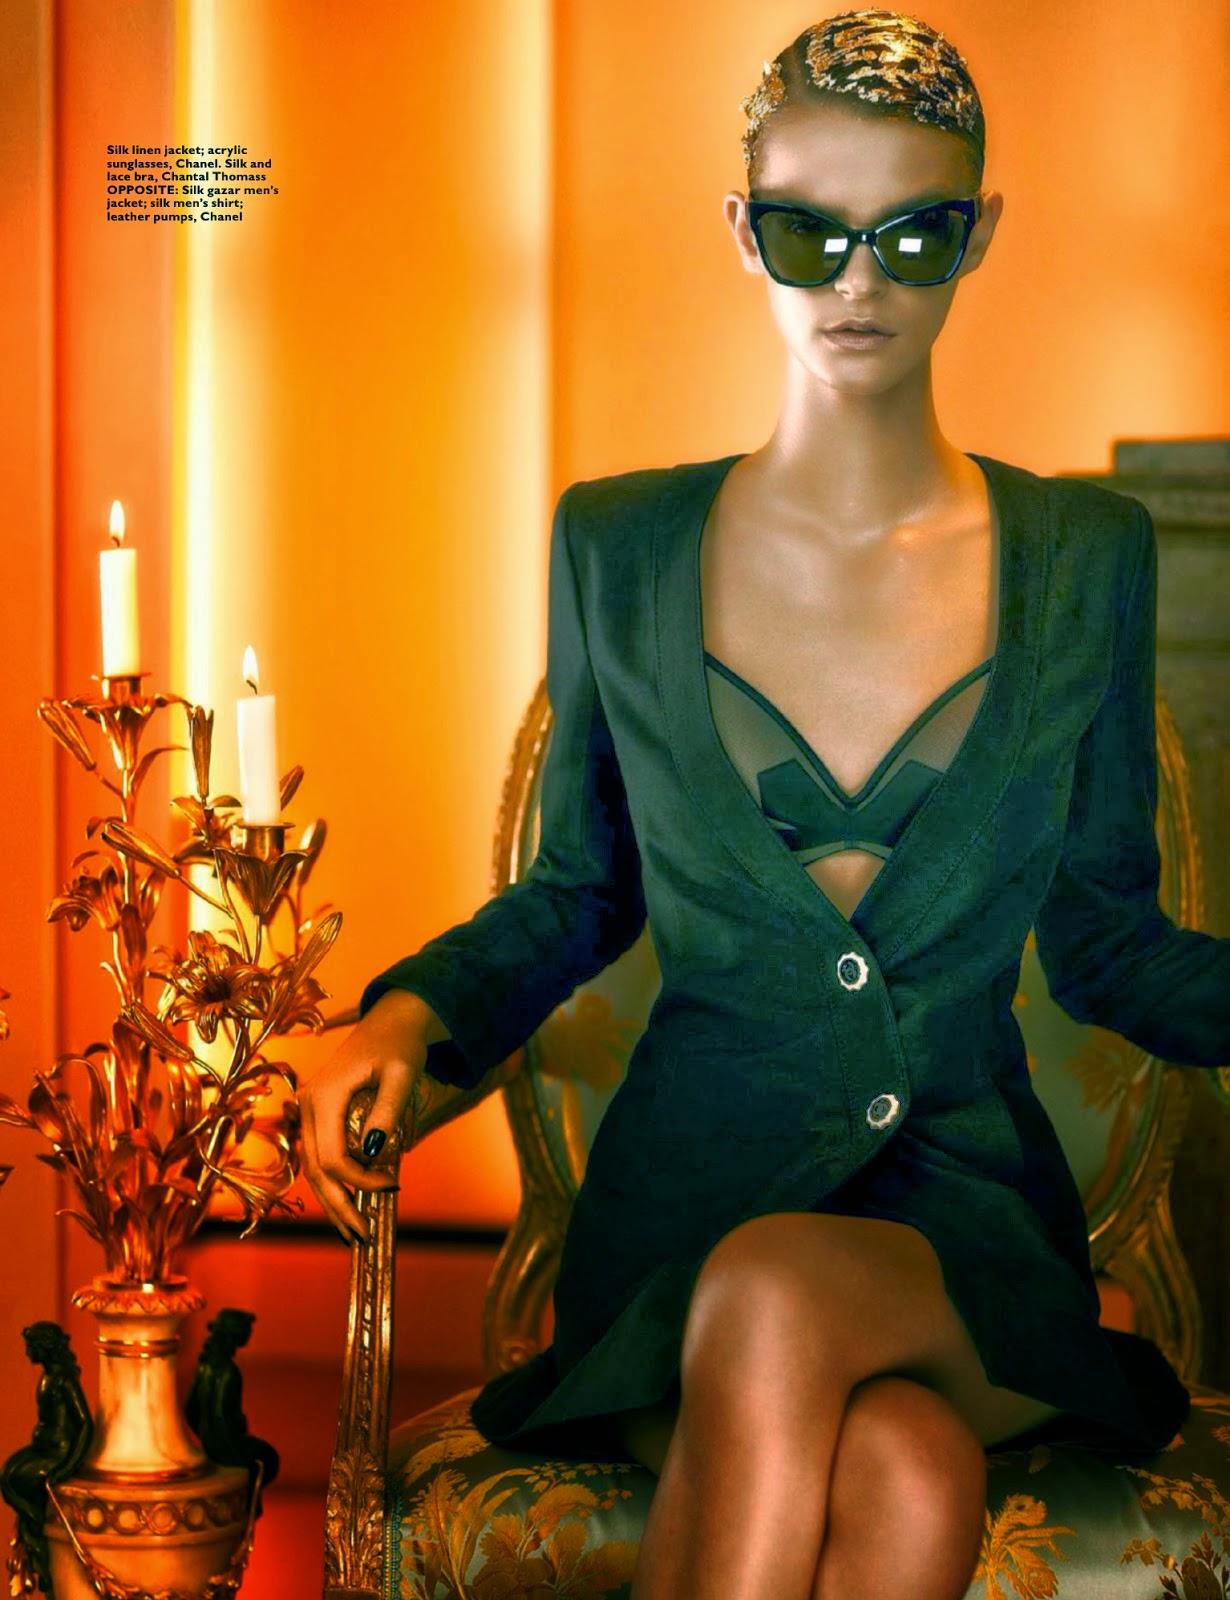 Magazine Photoshoot : Brogan Loftus Magazine Photoshoot by Thomas Cooksey for Harpe's Bazaar Singapore December